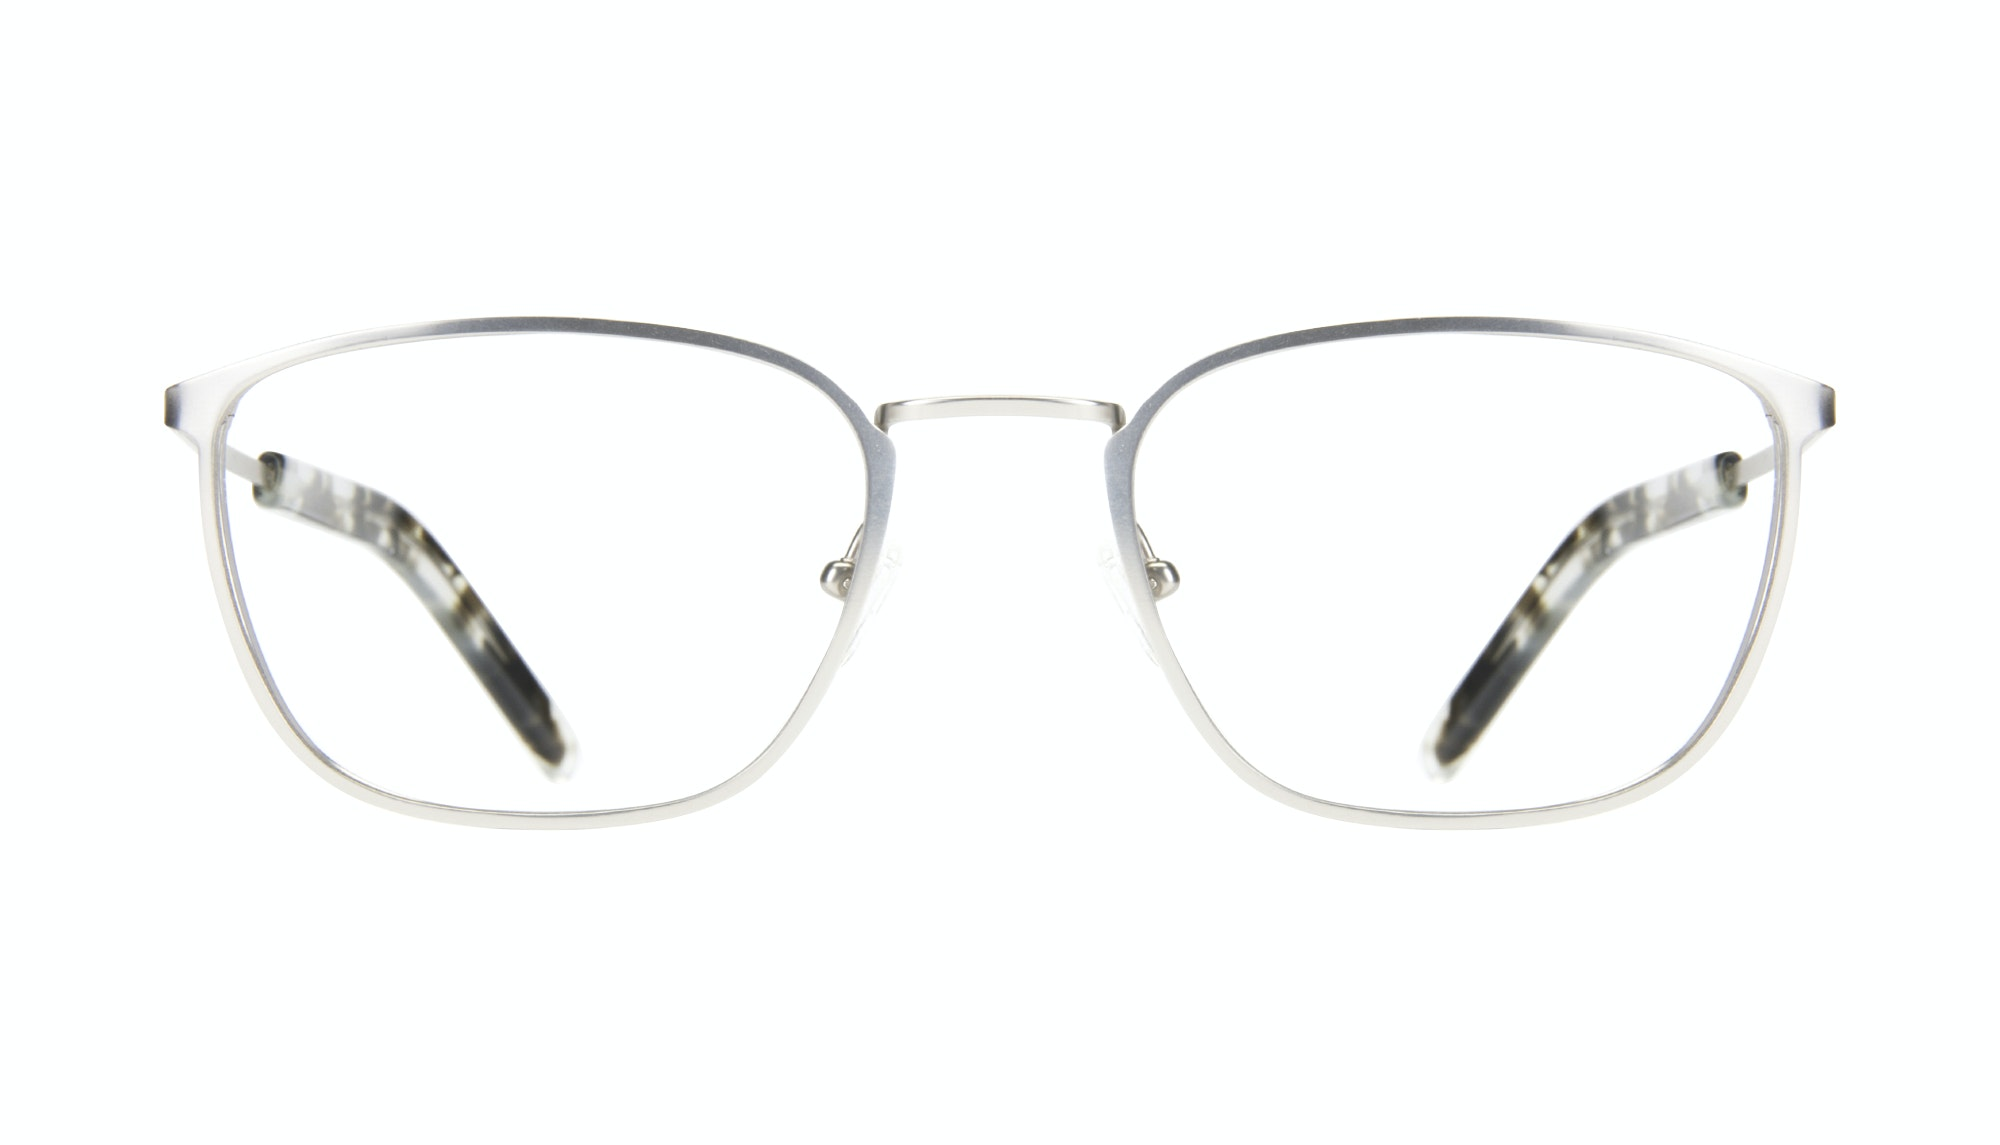 Affordable Fashion Glasses Rectangle Eyeglasses Men Edge Silver